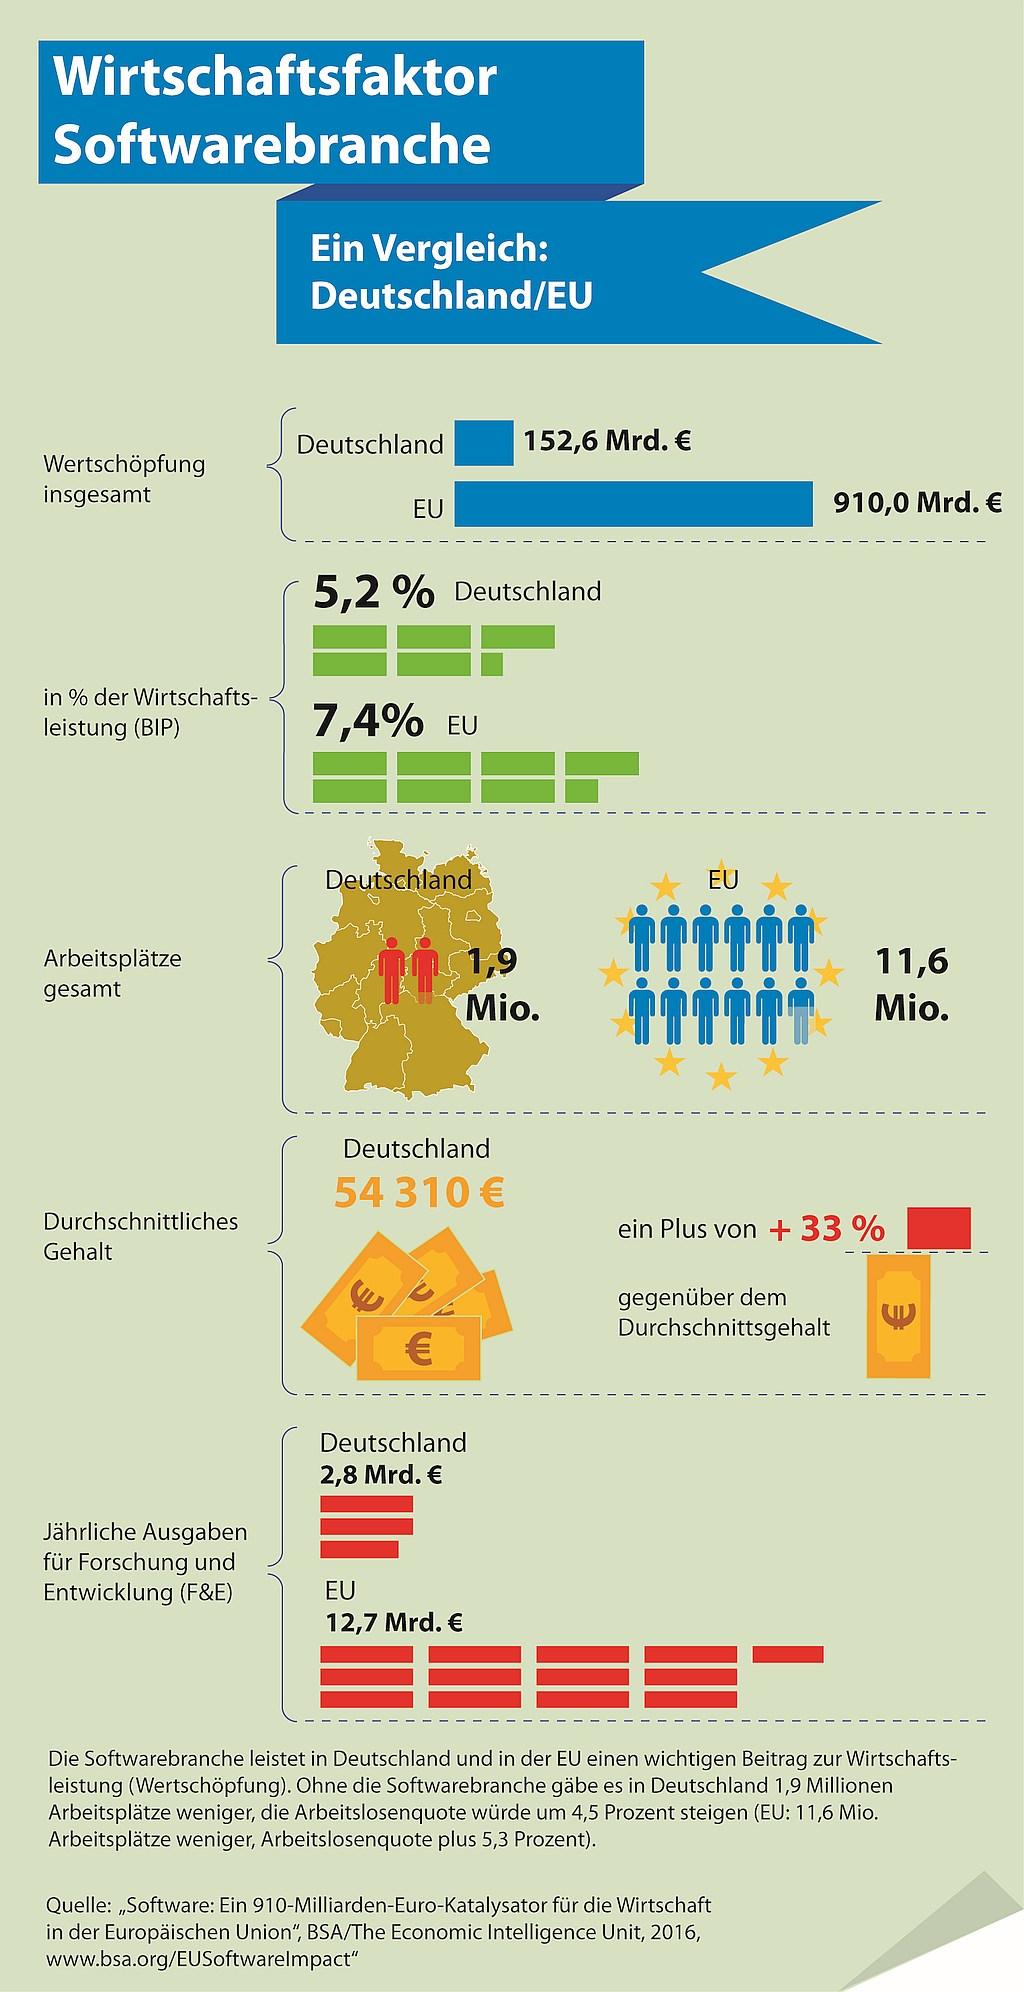 infografik-bsa-wirtschaftsfaktor-softwarebranche-2016